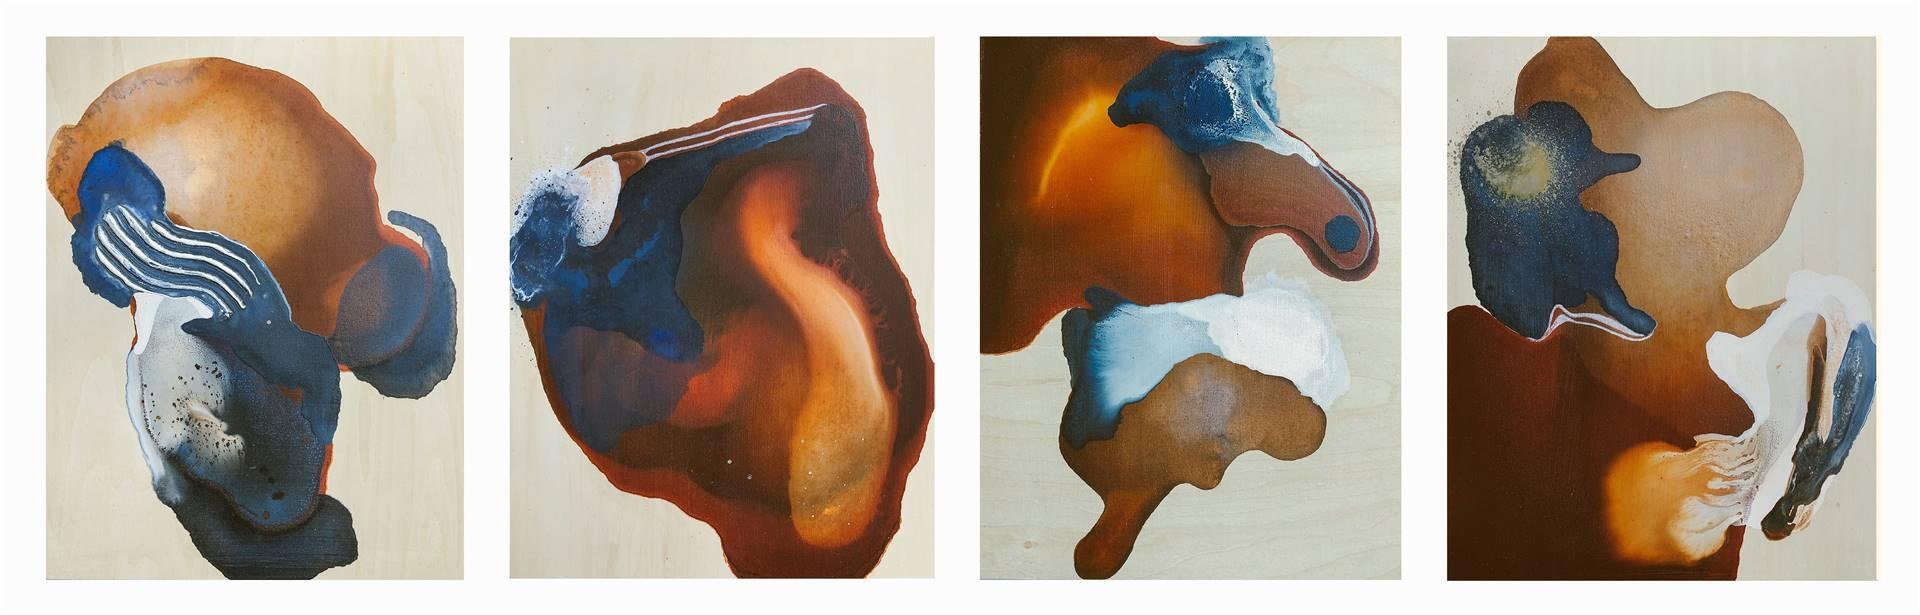 Orianna Montenegro, Spilled Coffee series, Acrylic & Mixed Media, 14 x 47 image